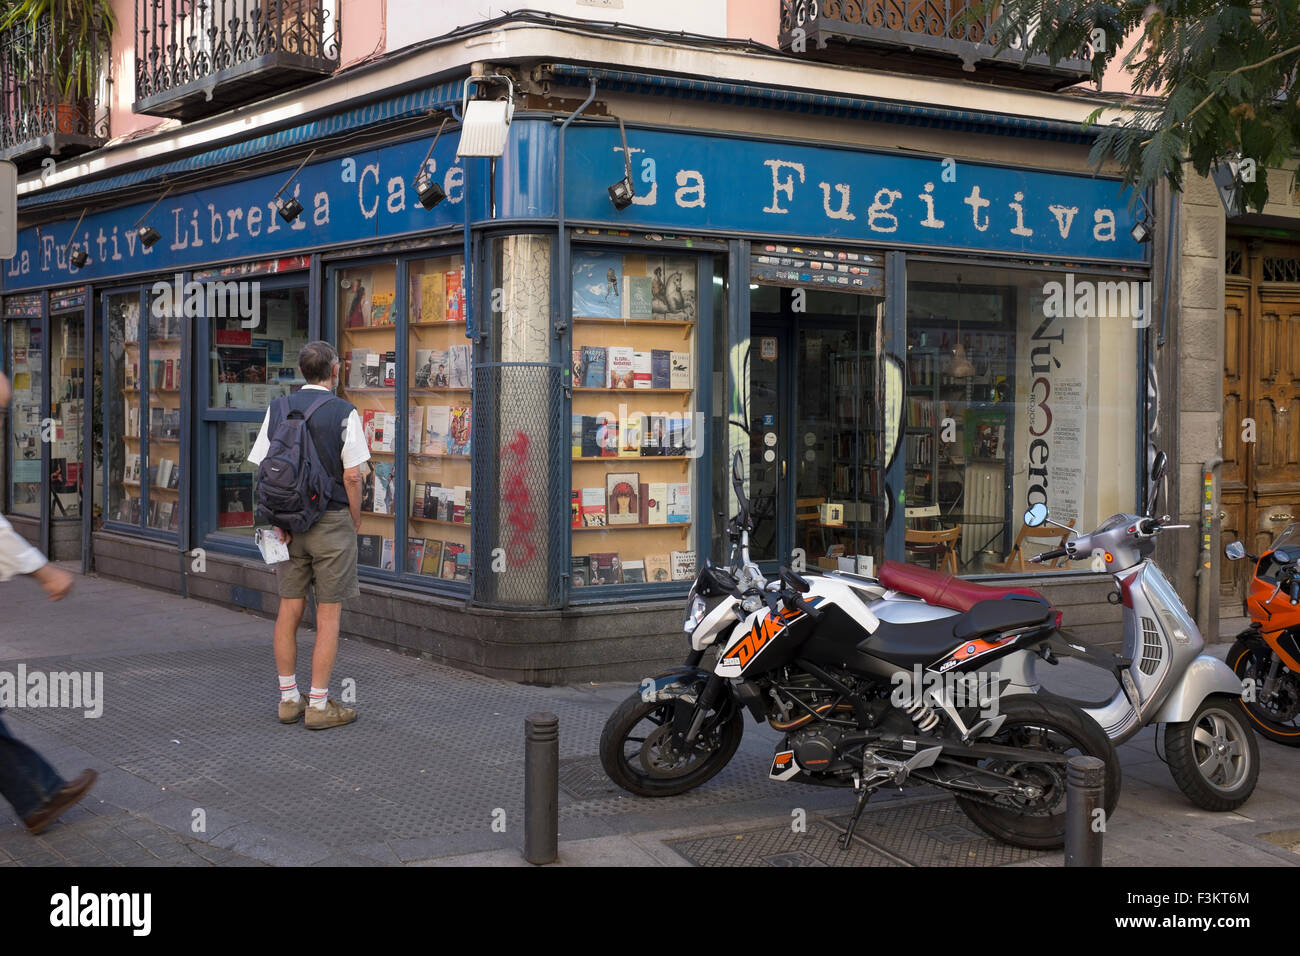 La Fugitiva Bookstore Madrid Spain - Stock Image